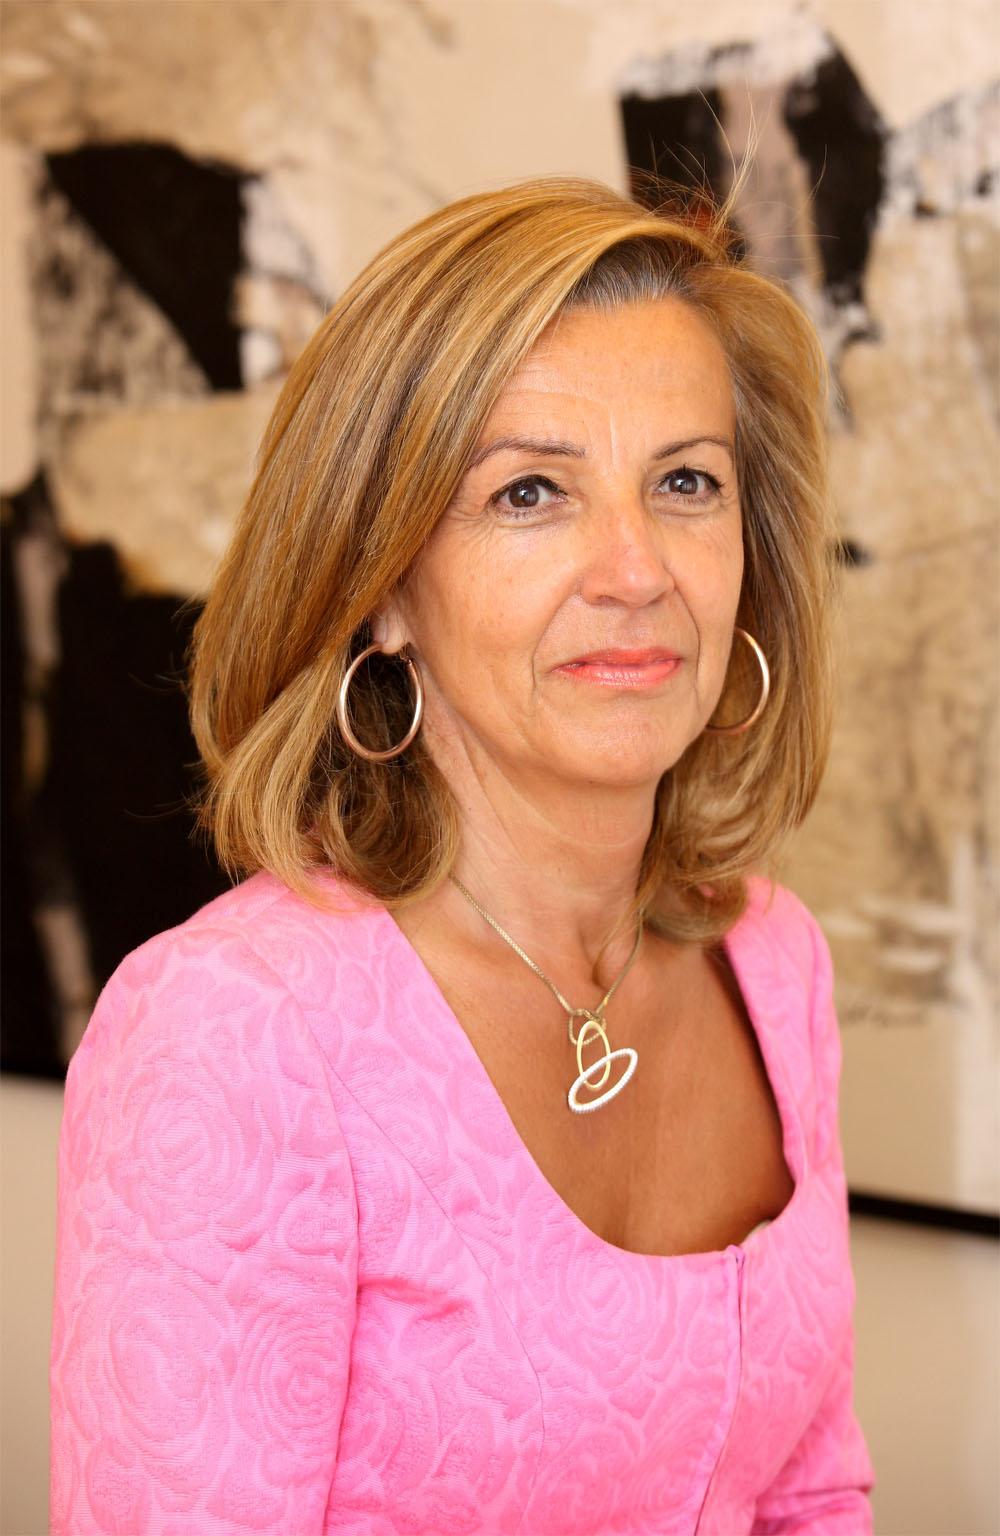 Carmen Gonzalez Poblet